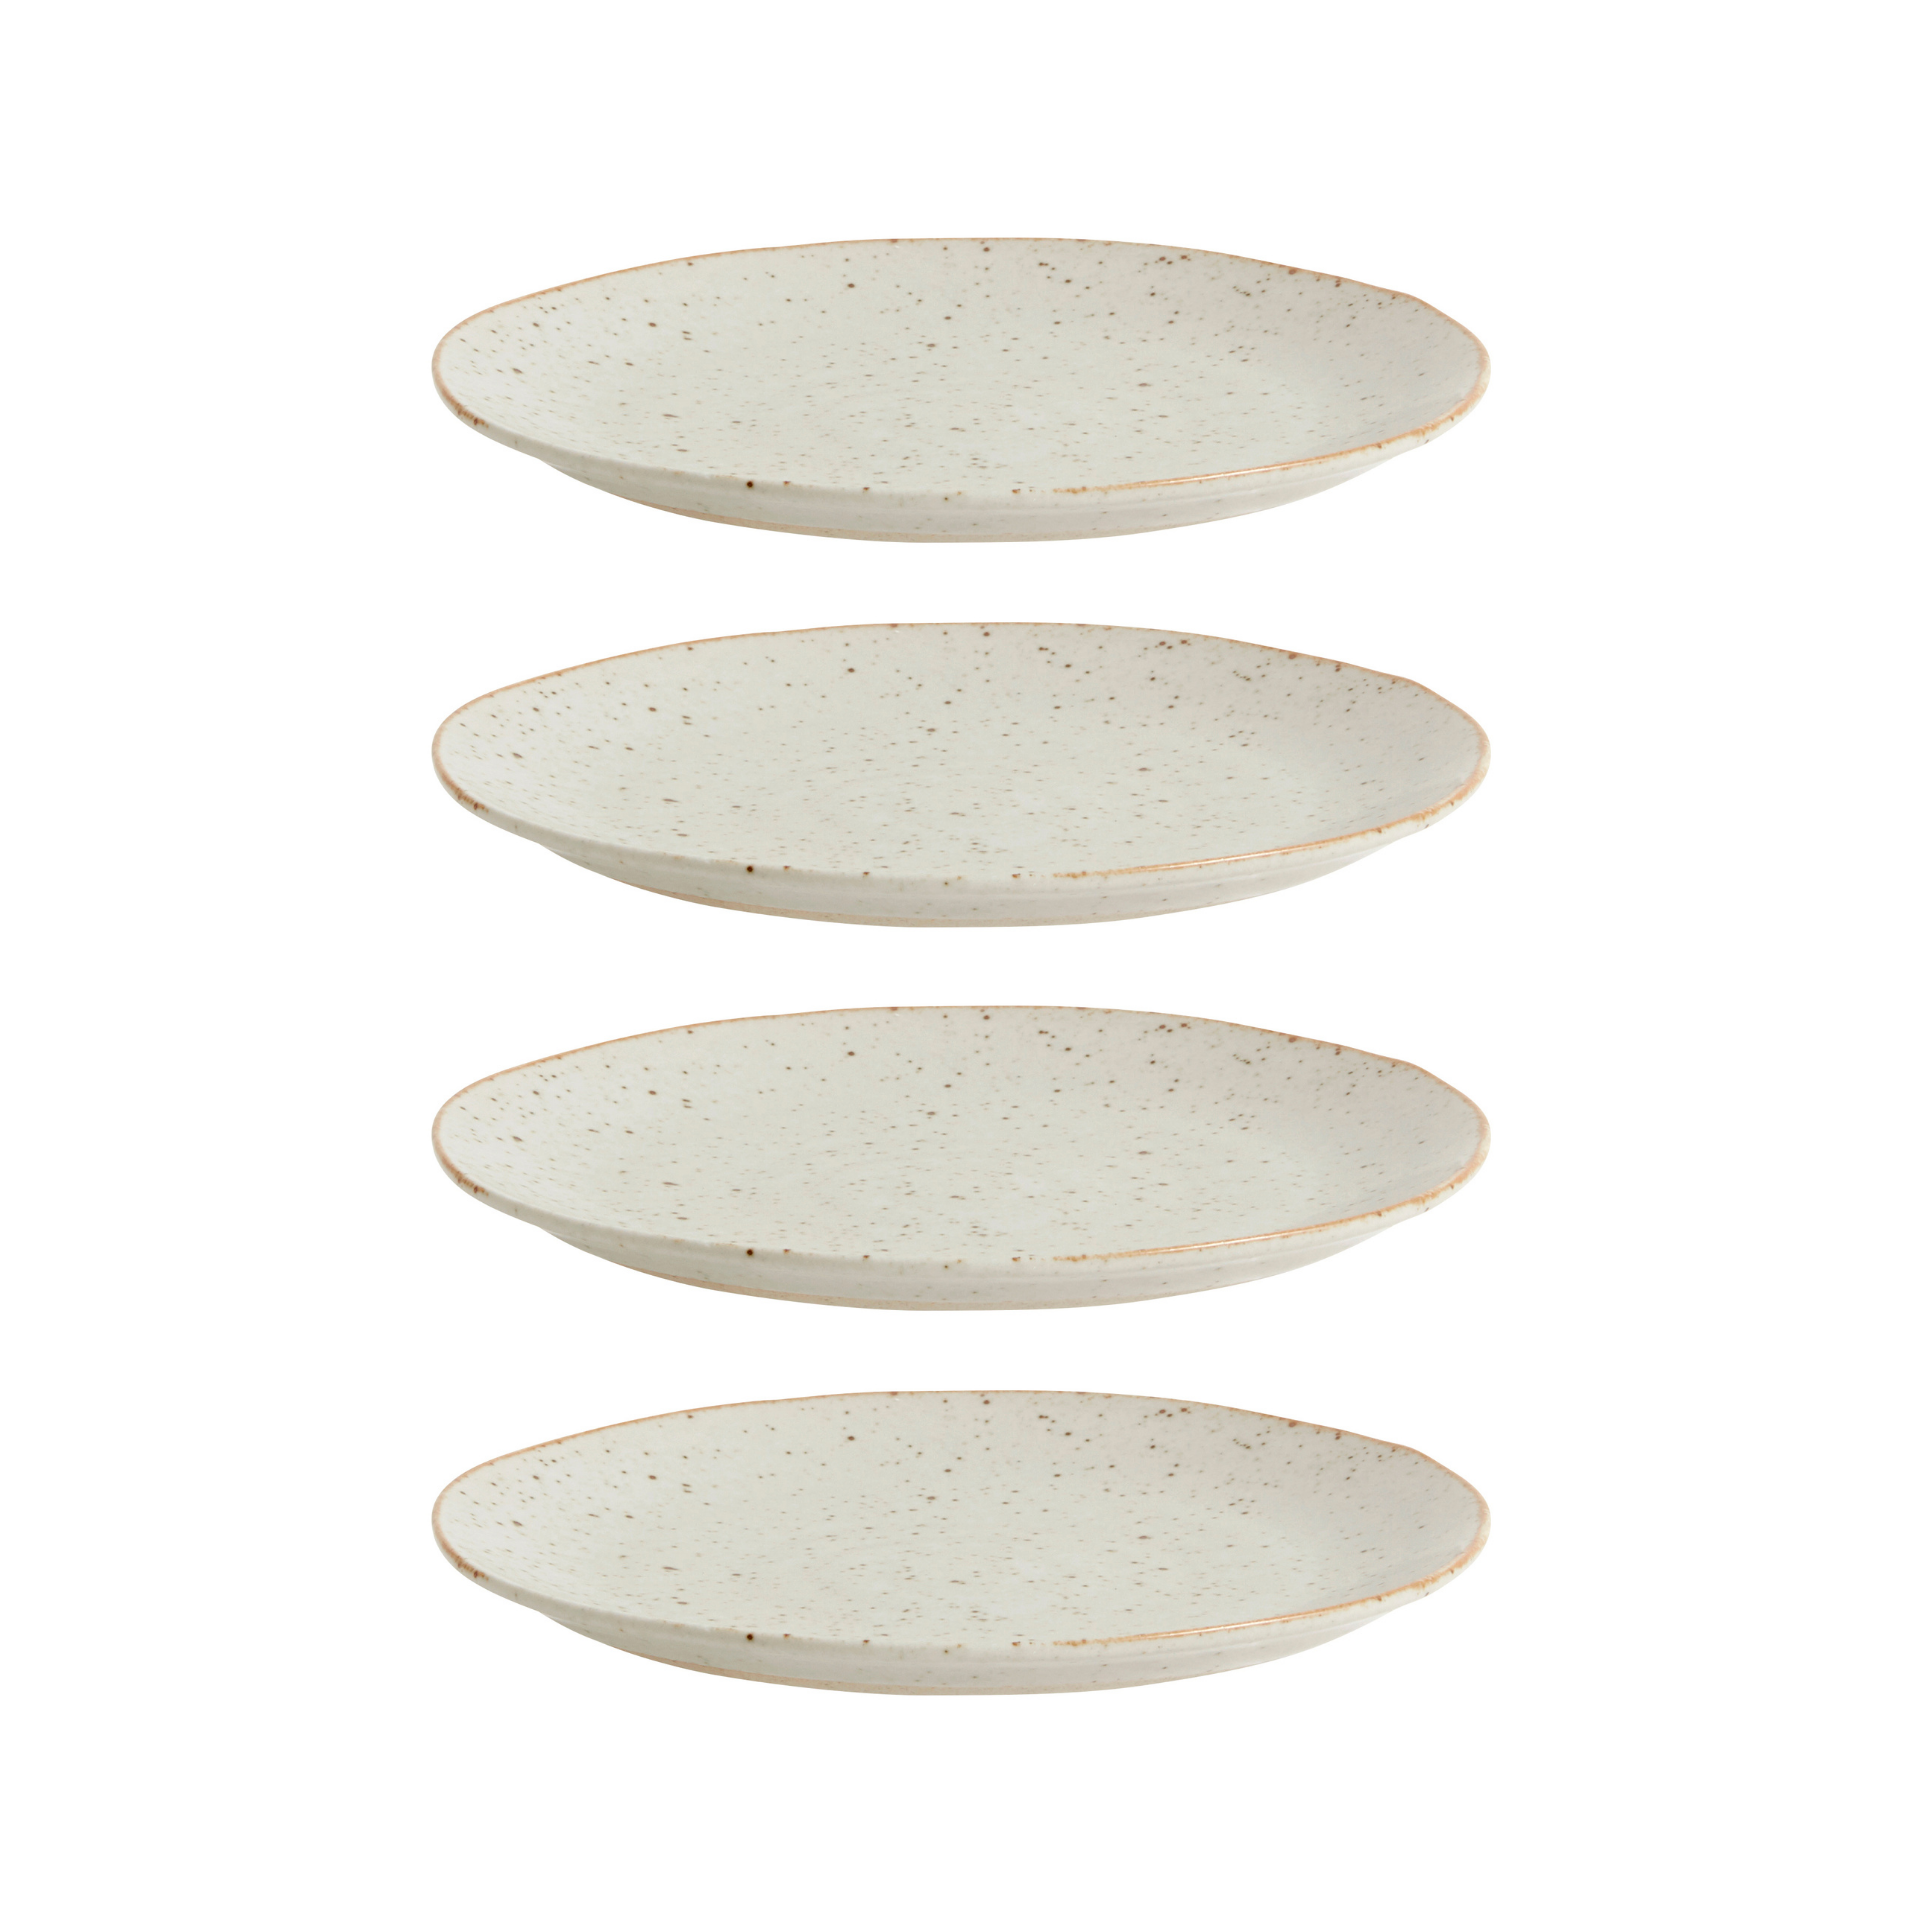 Nordal Grainy gebaksbord - zandkleurig - set van 4-57014-5708309157931